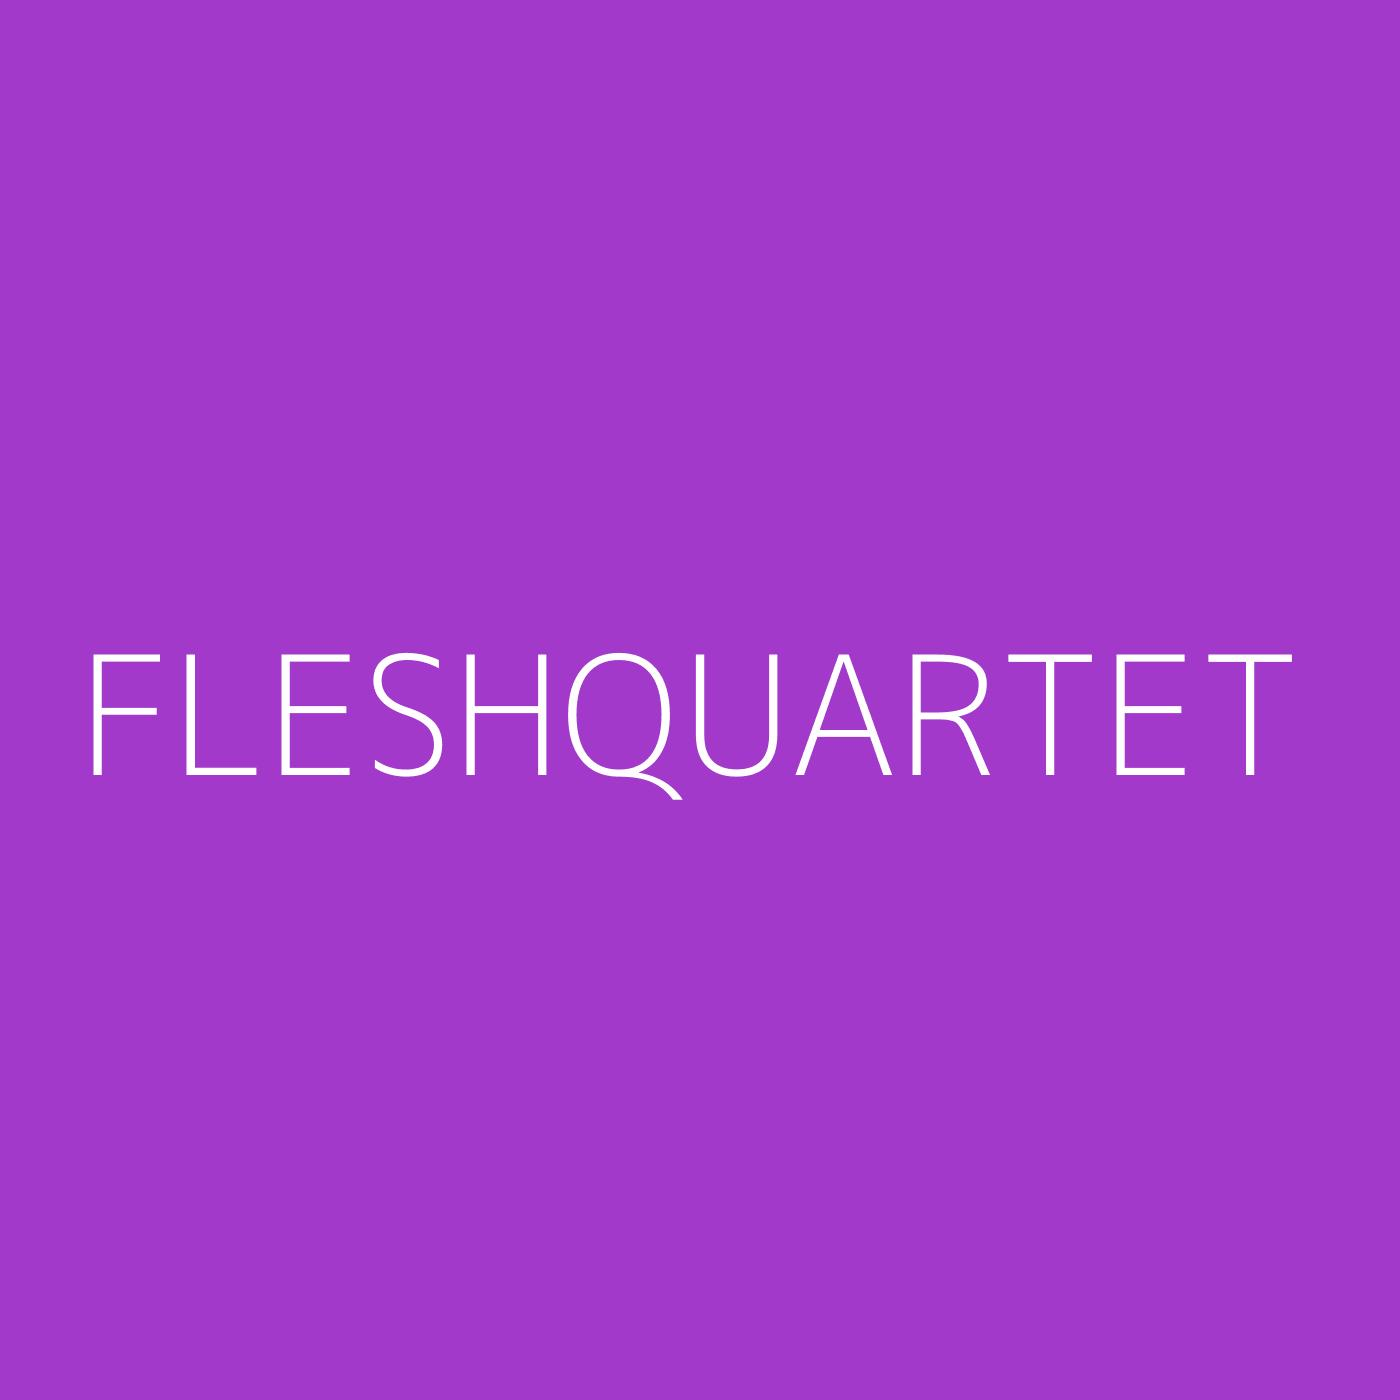 Fleshquartet Playlist Artwork